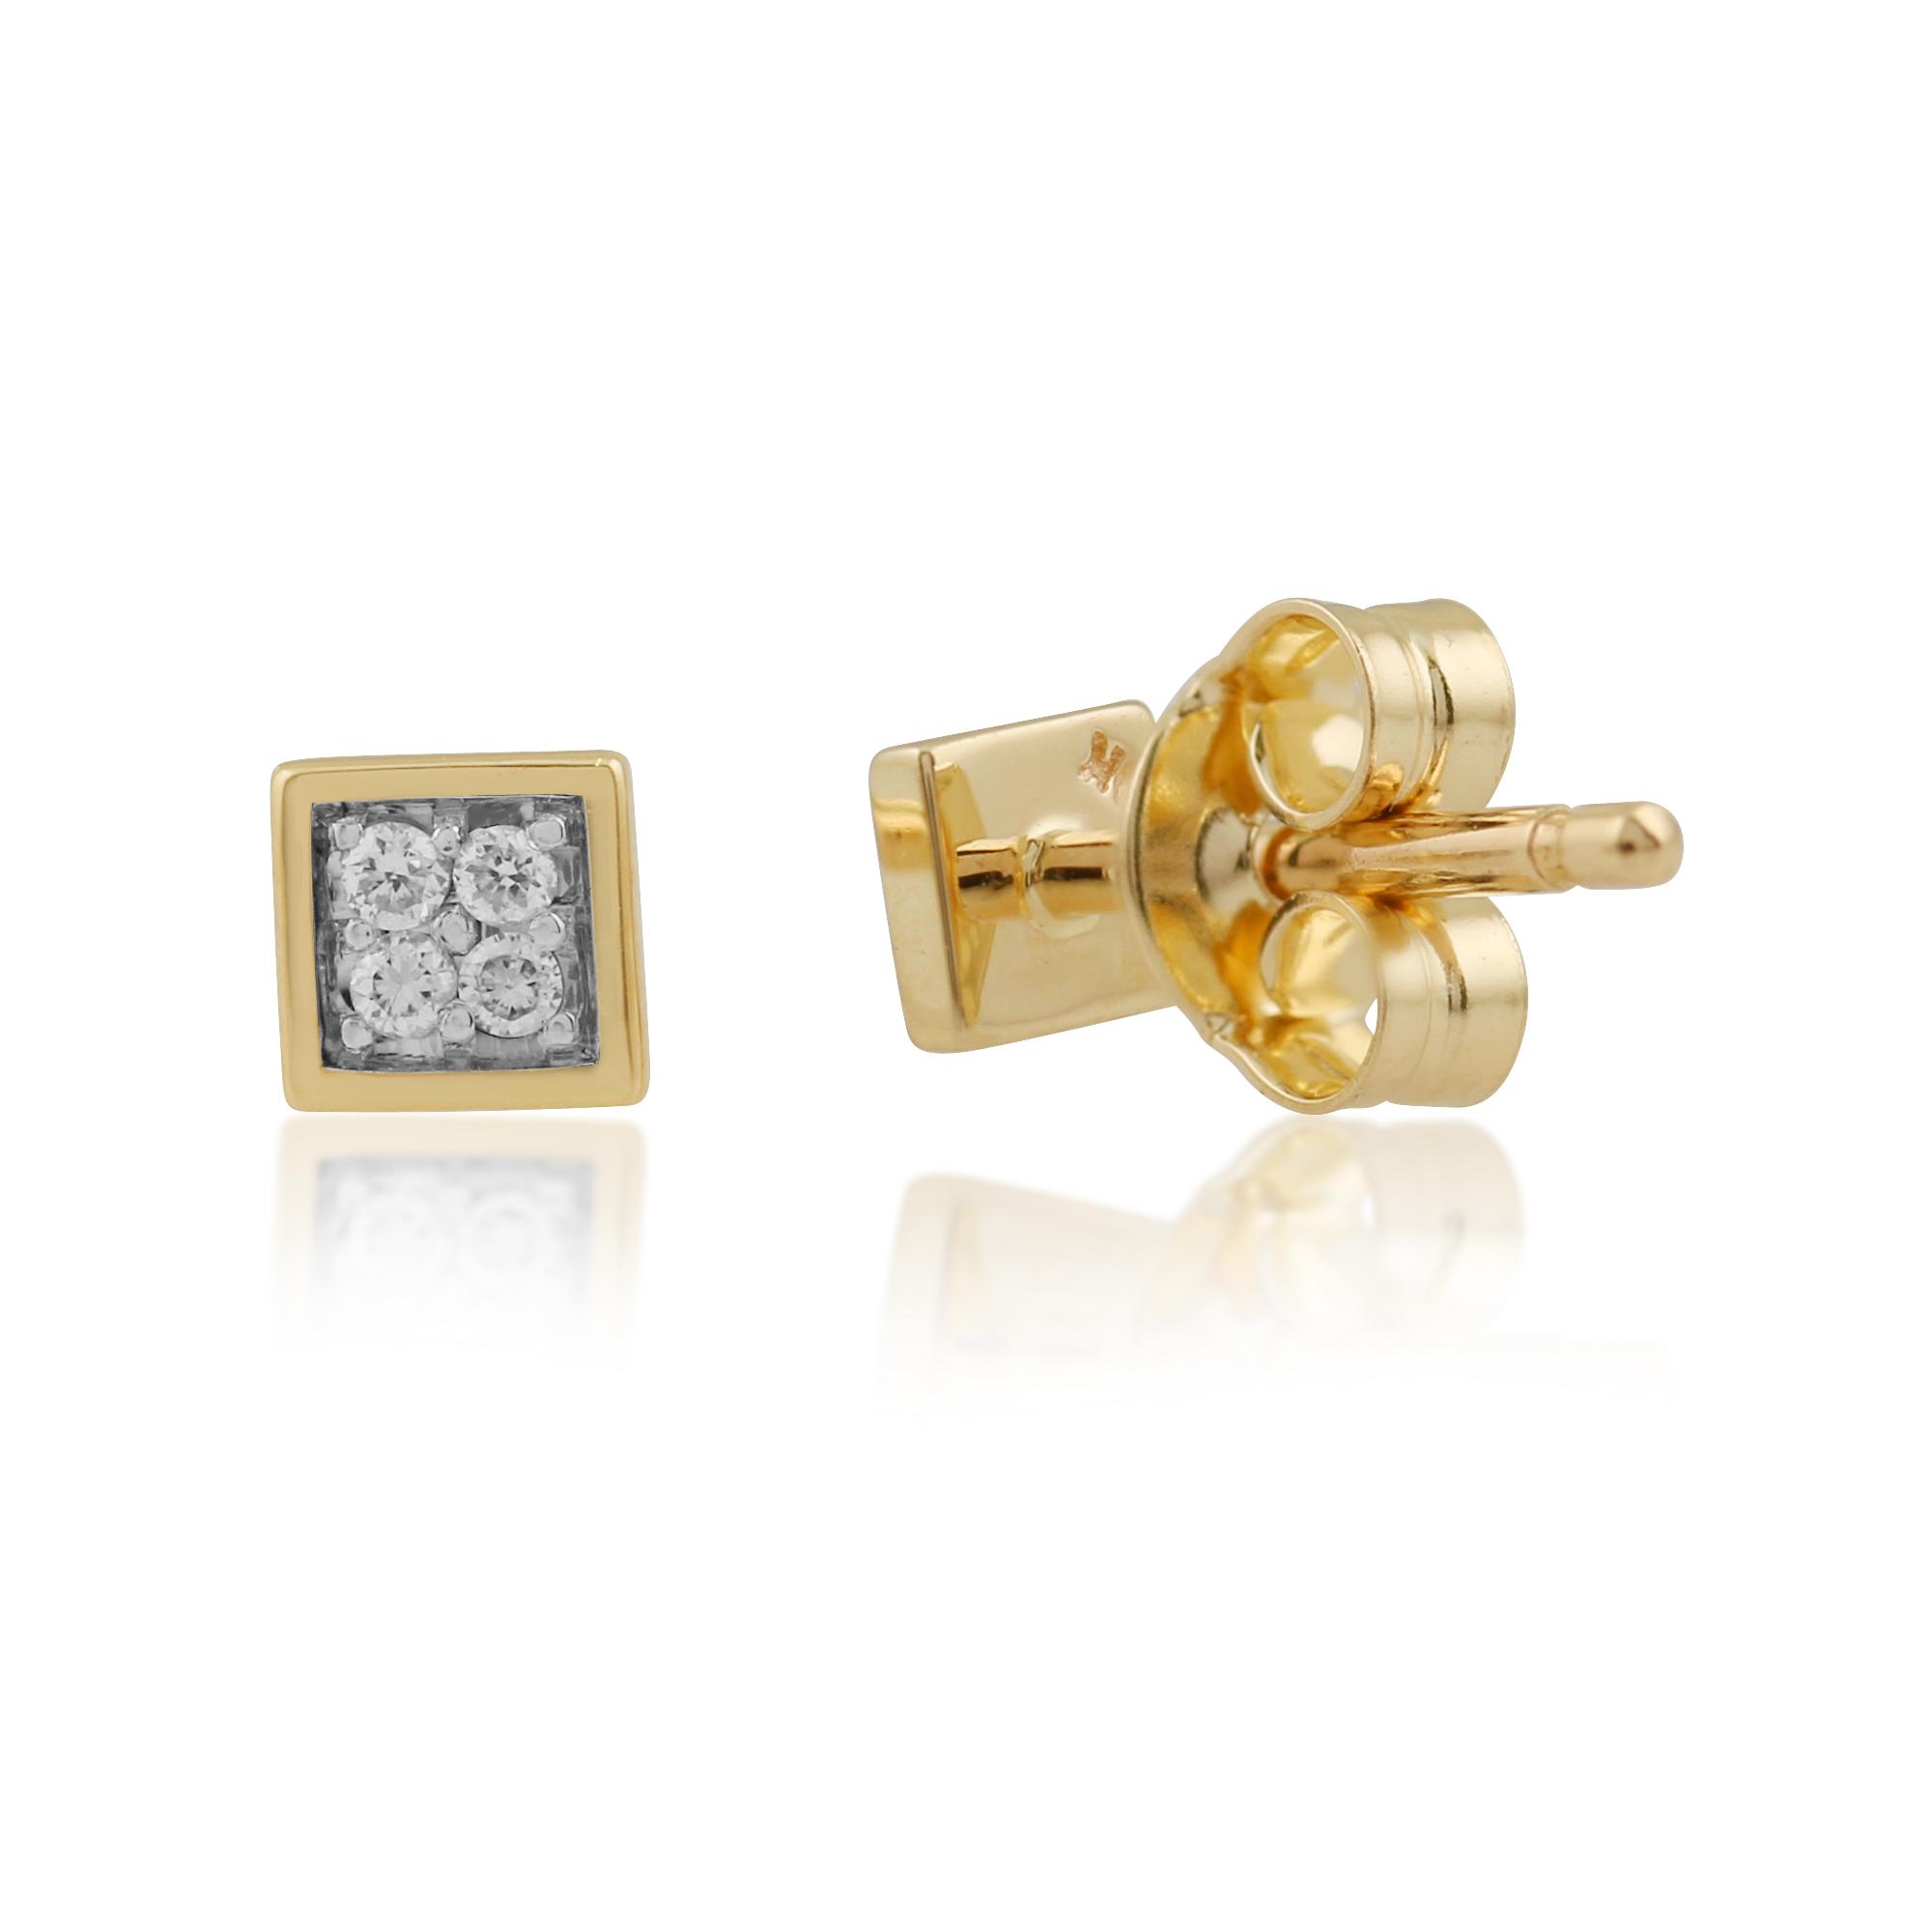 Amazoncom white gold square stud earrings